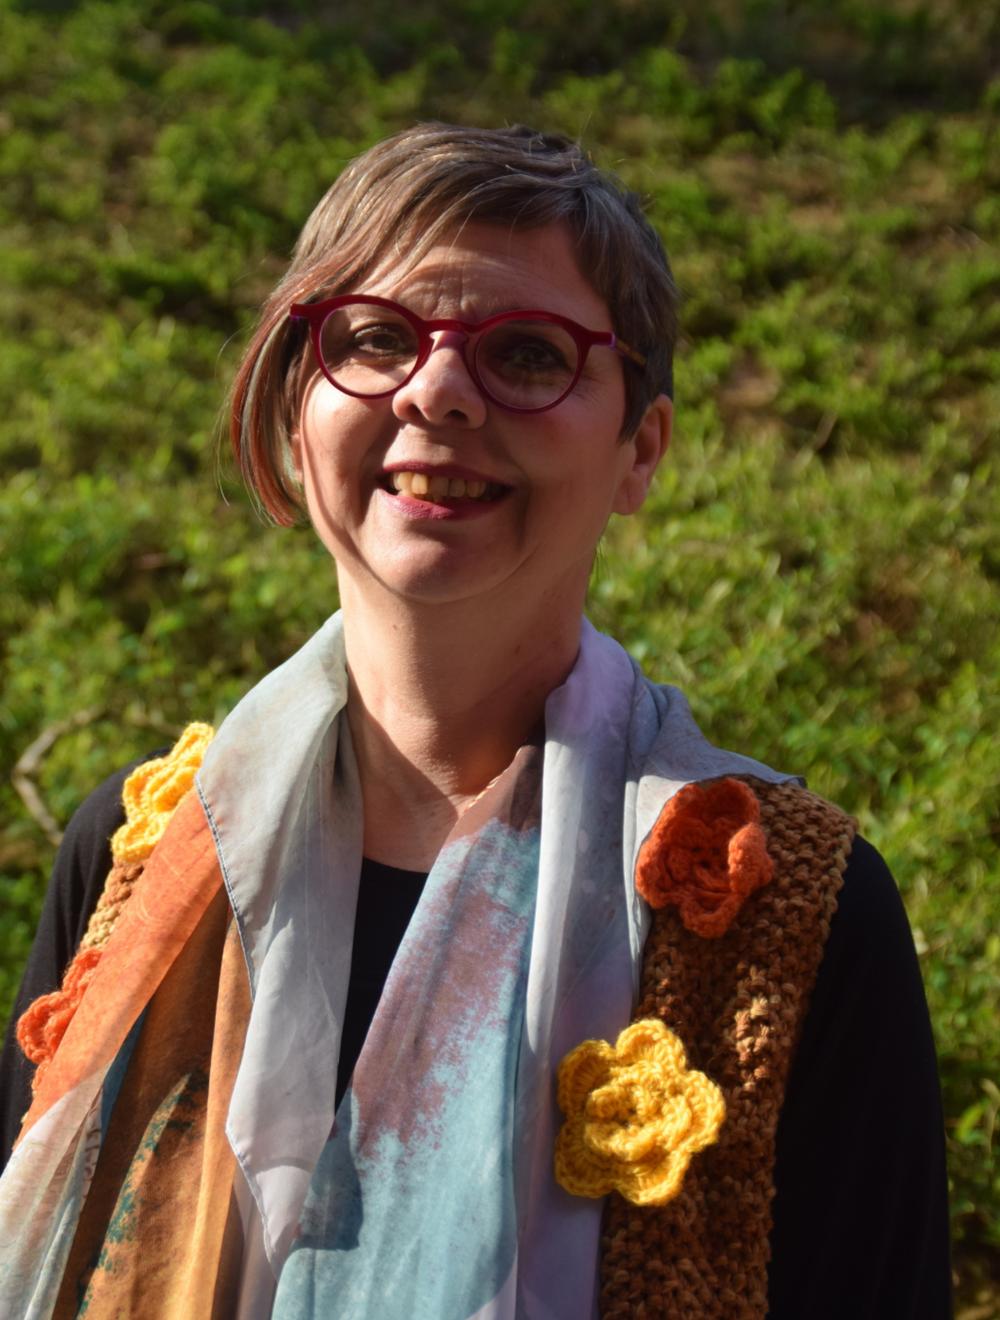 Marita Habgood als Schriftführerin nominiert